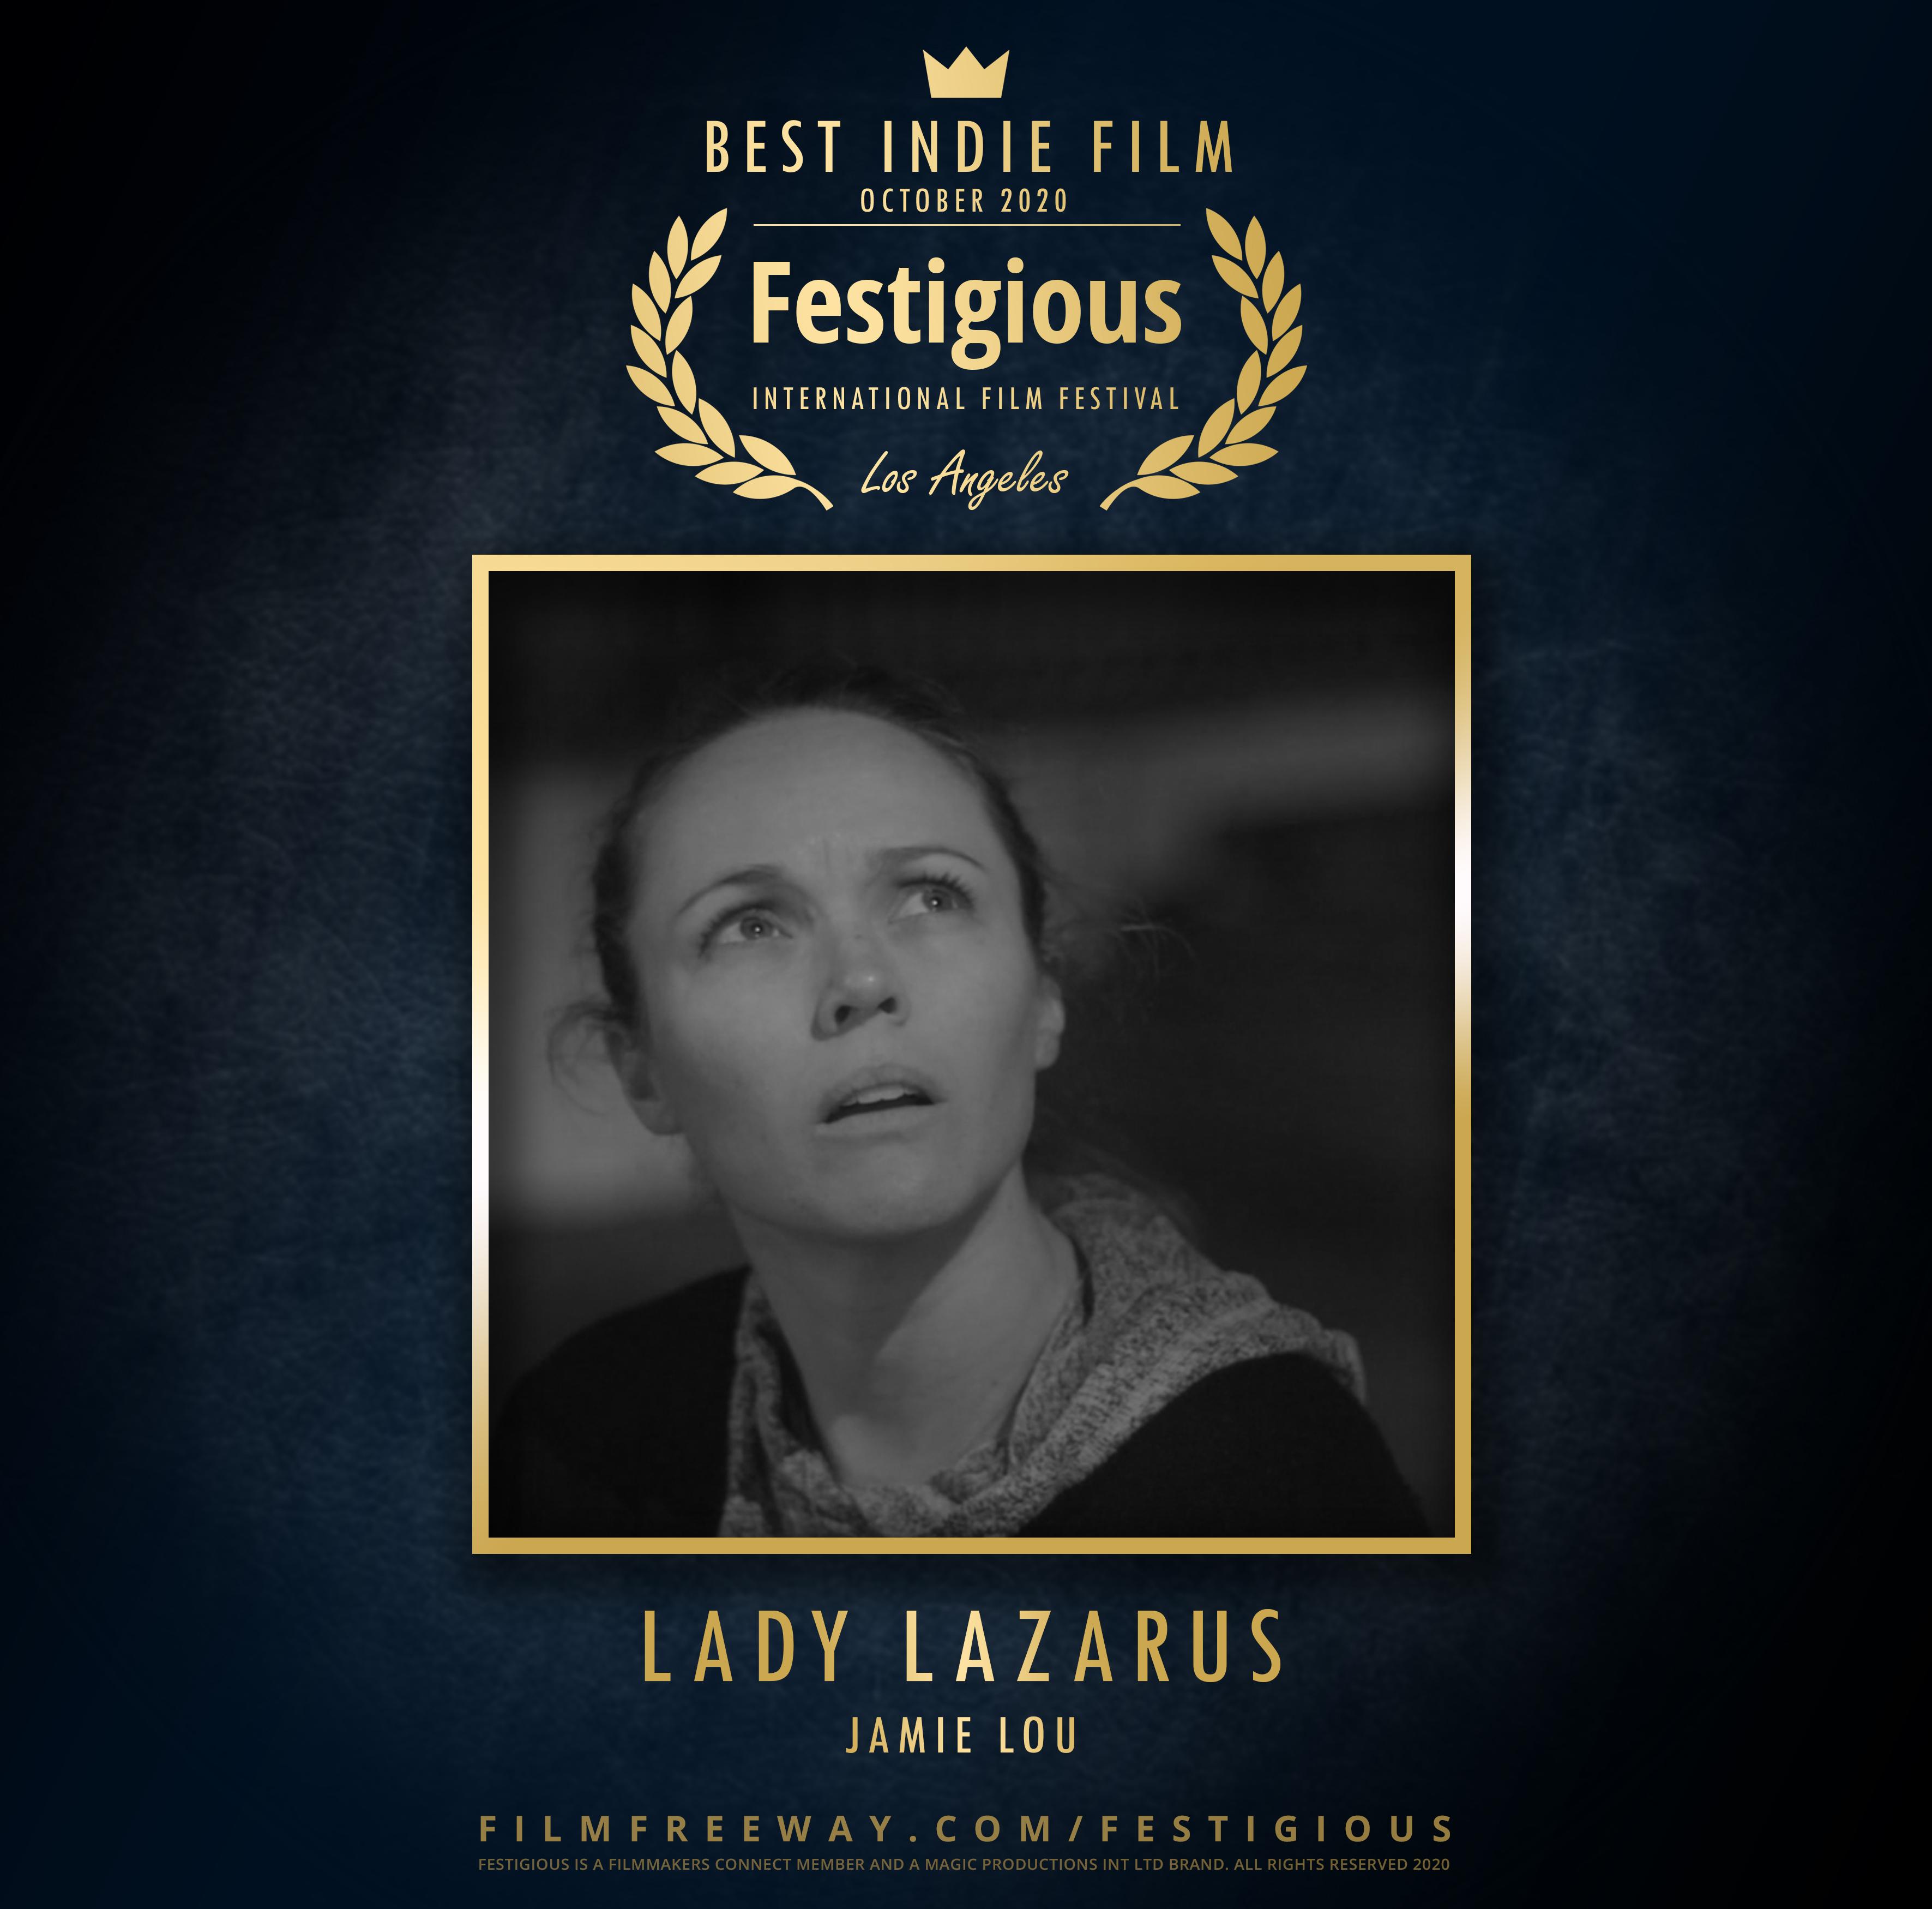 Lady Lazarus design